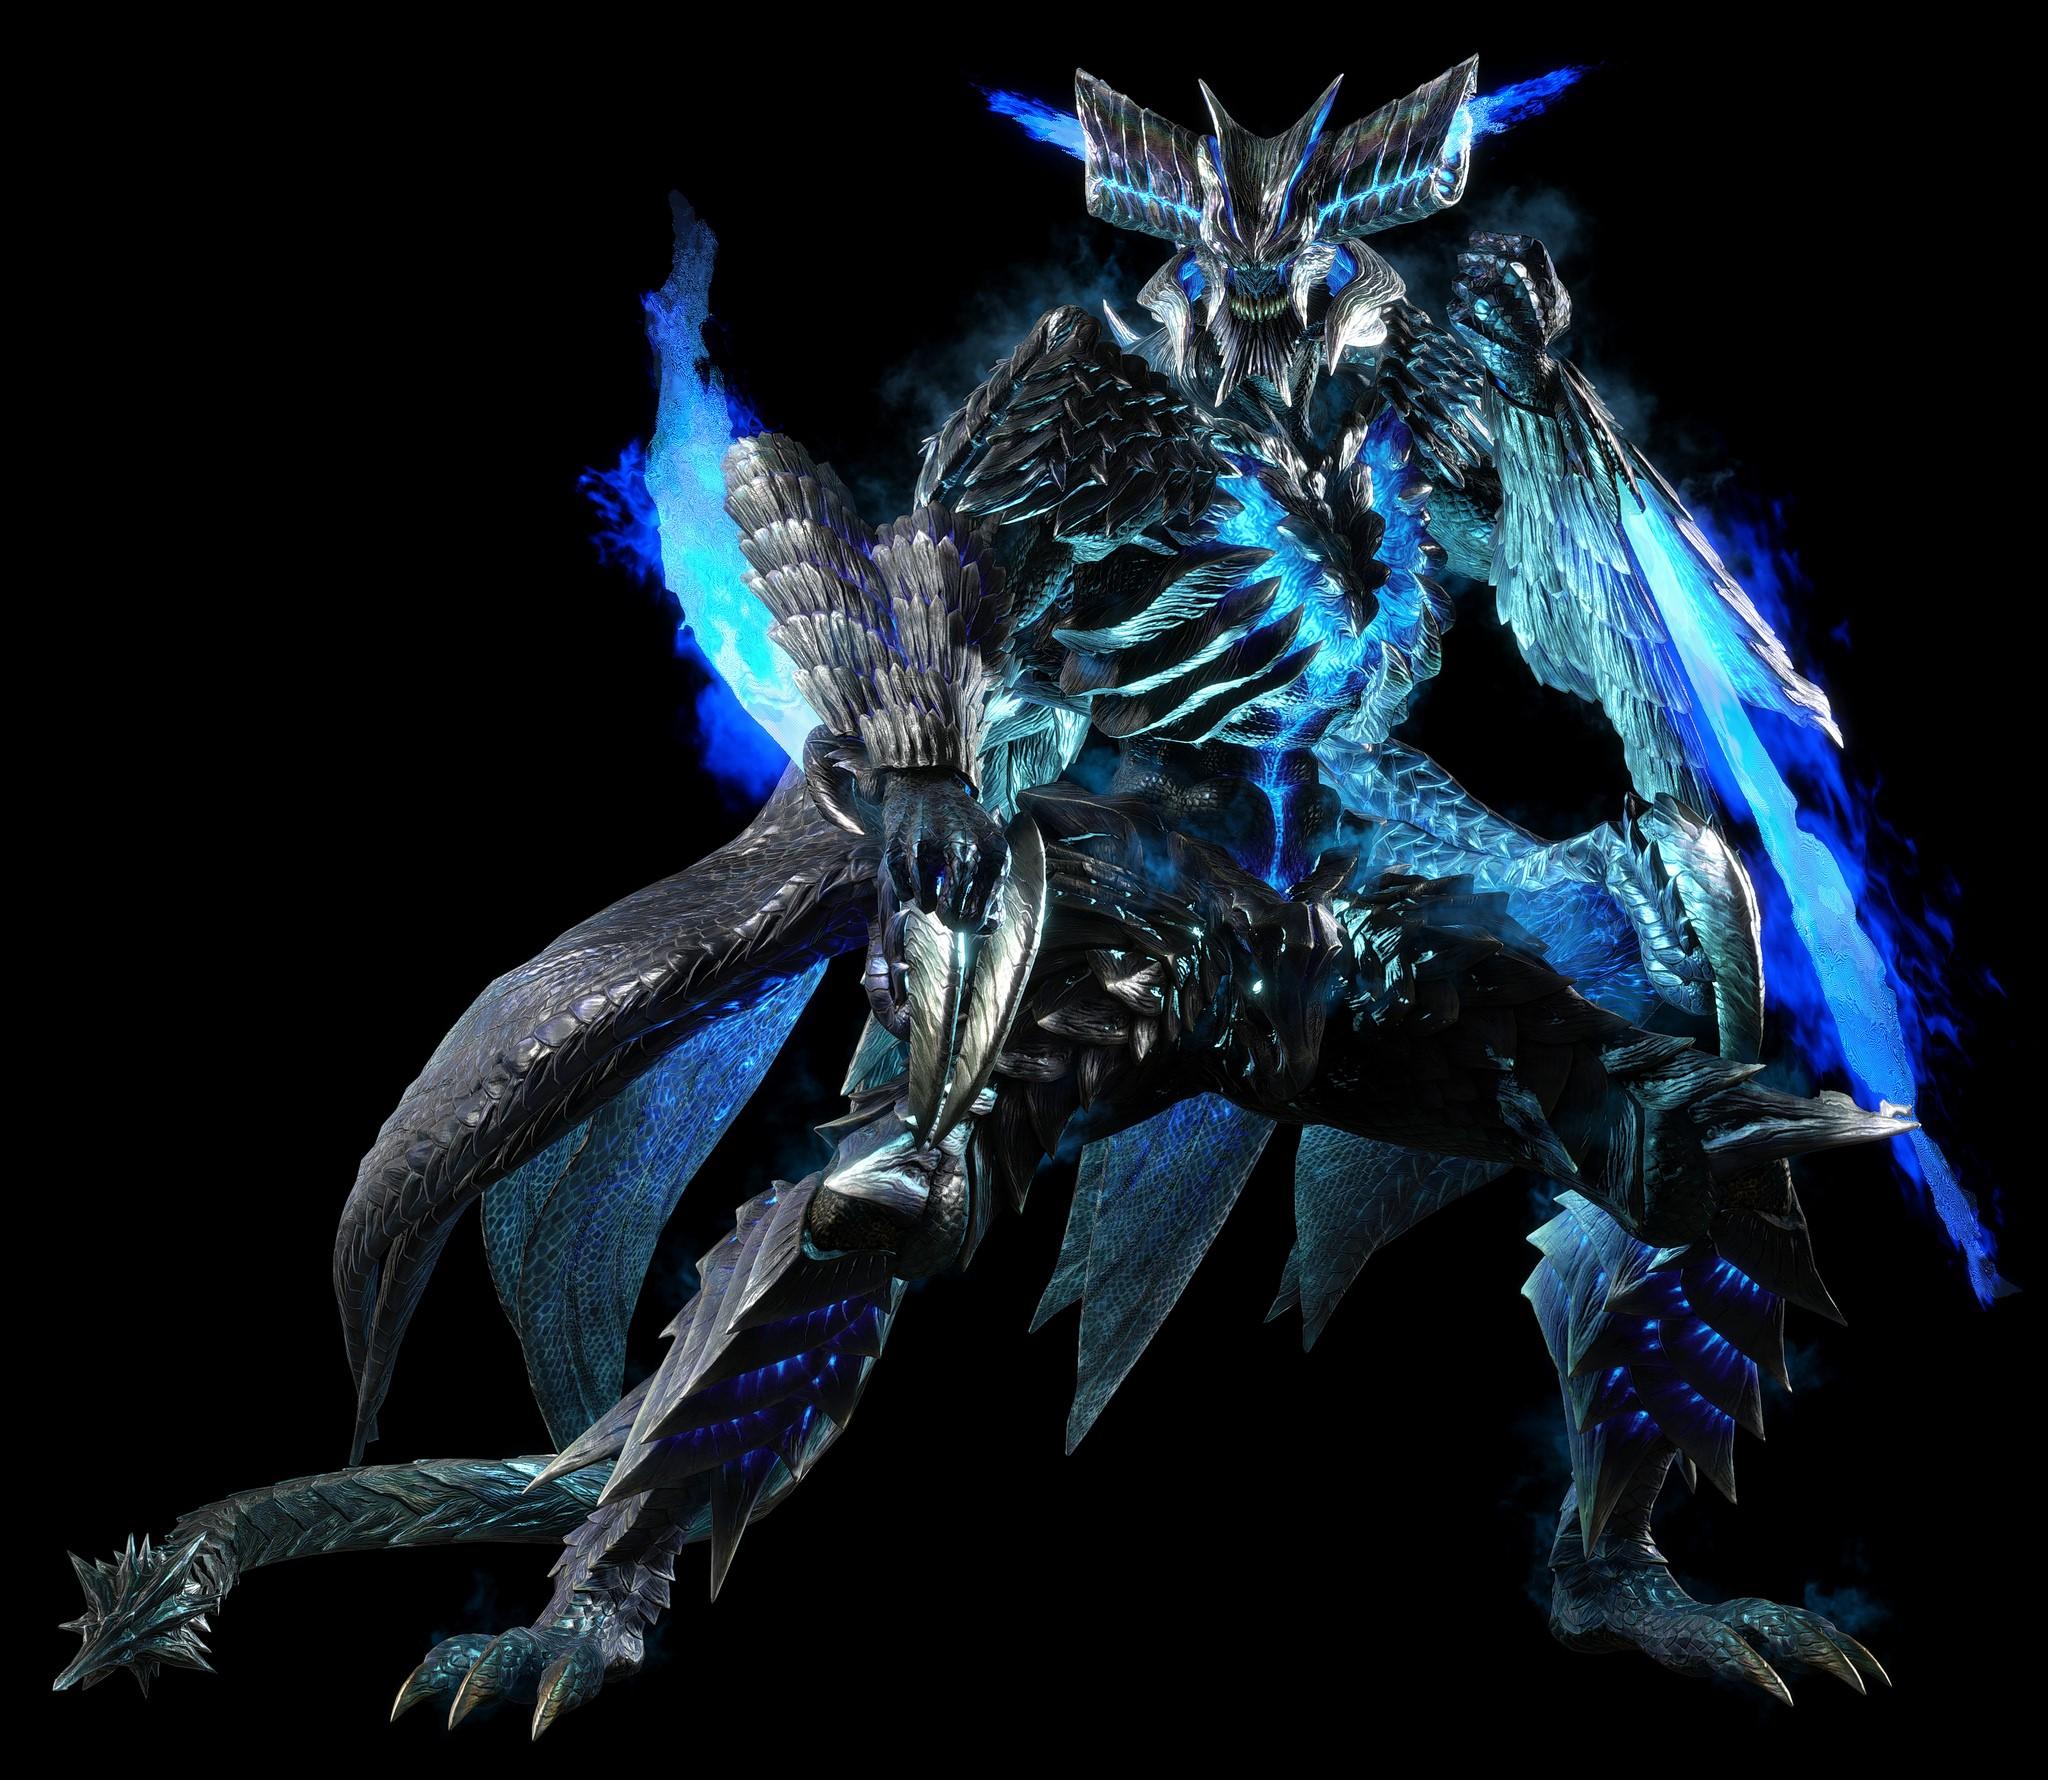 Обои the dark slayer, the son of sparda, демоны, sparda, gilver, nelo angelo, nelo angelo. Игры foto 8